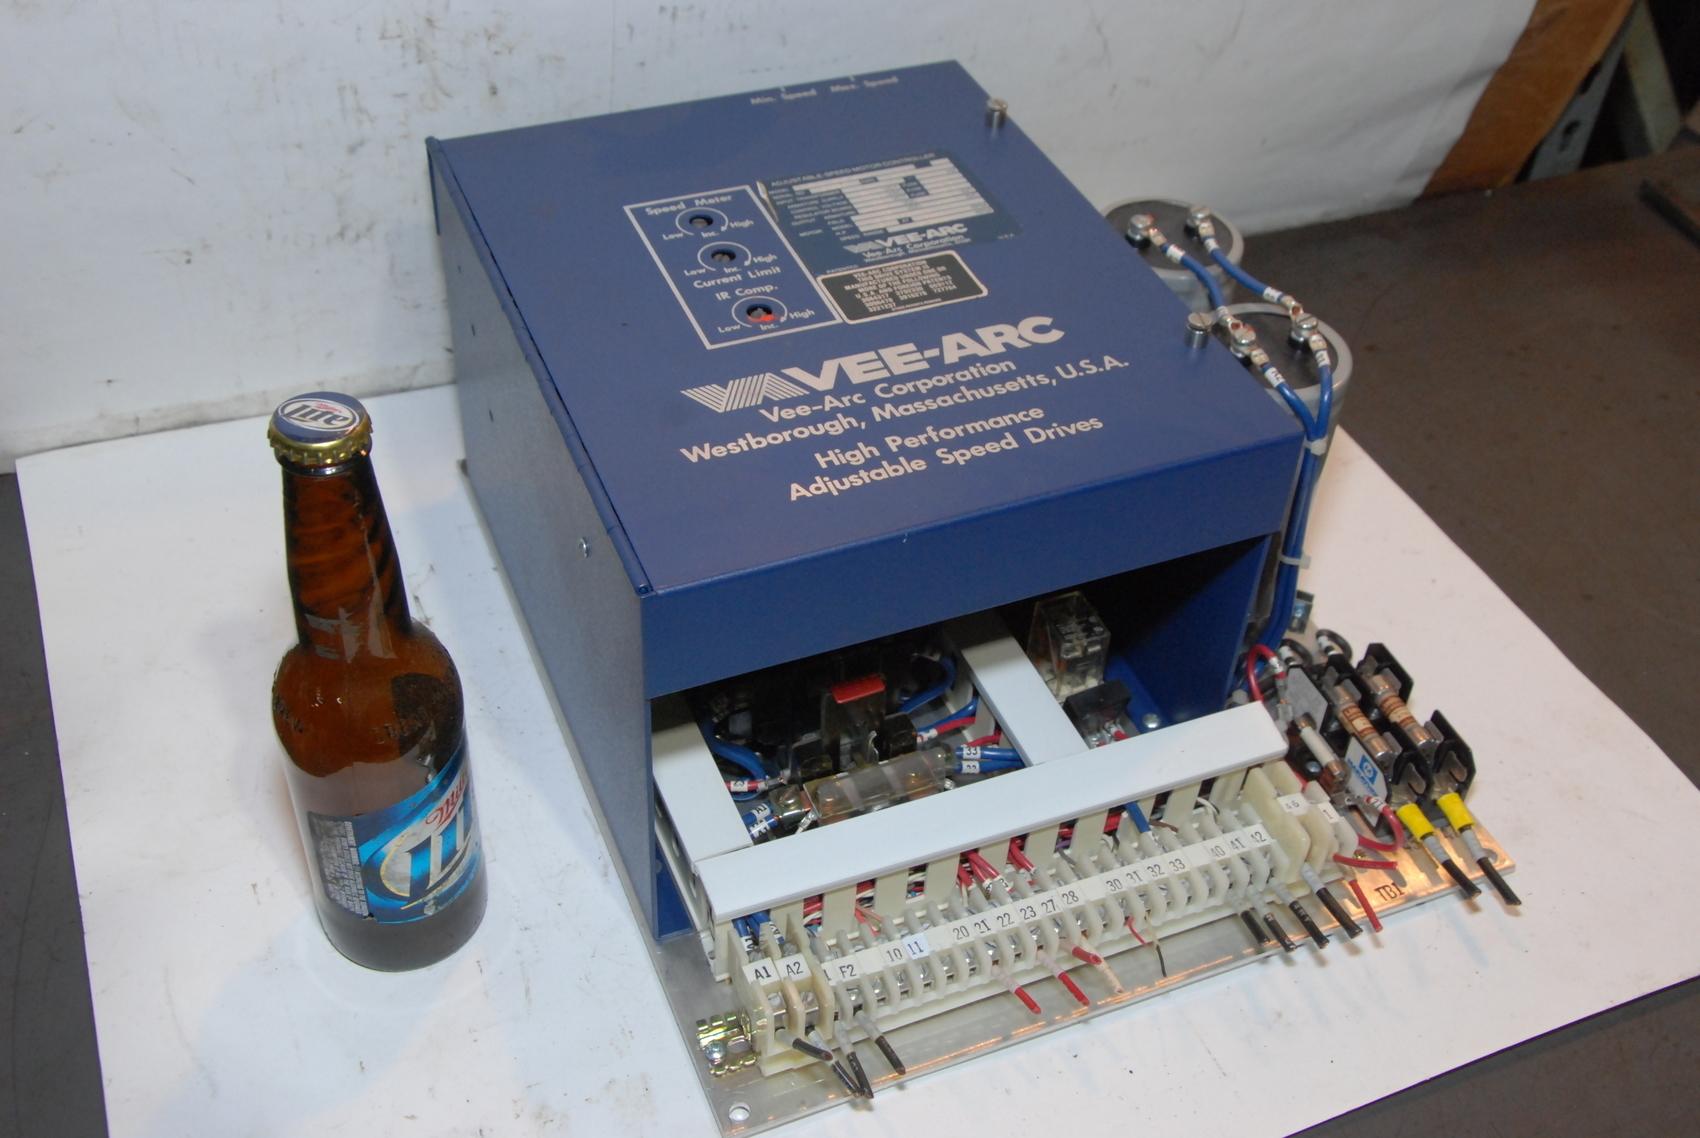 VEE-ARC R IV B-3 Hp Adjustable-Speed Motor Controller drive vfd